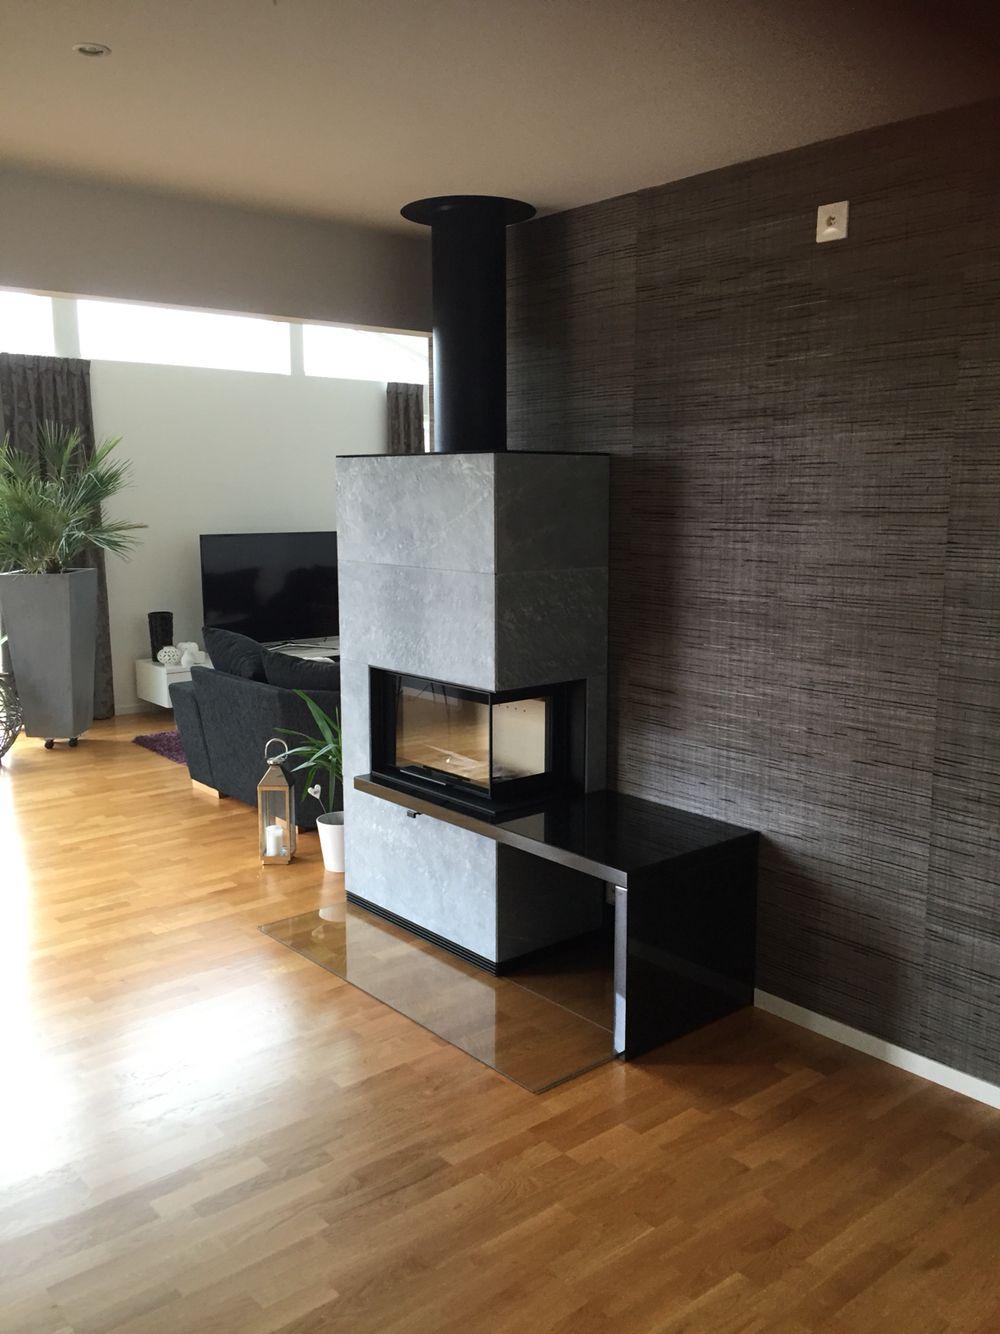 kamin contura kaminer kakelugnar kaminer pinterest. Black Bedroom Furniture Sets. Home Design Ideas